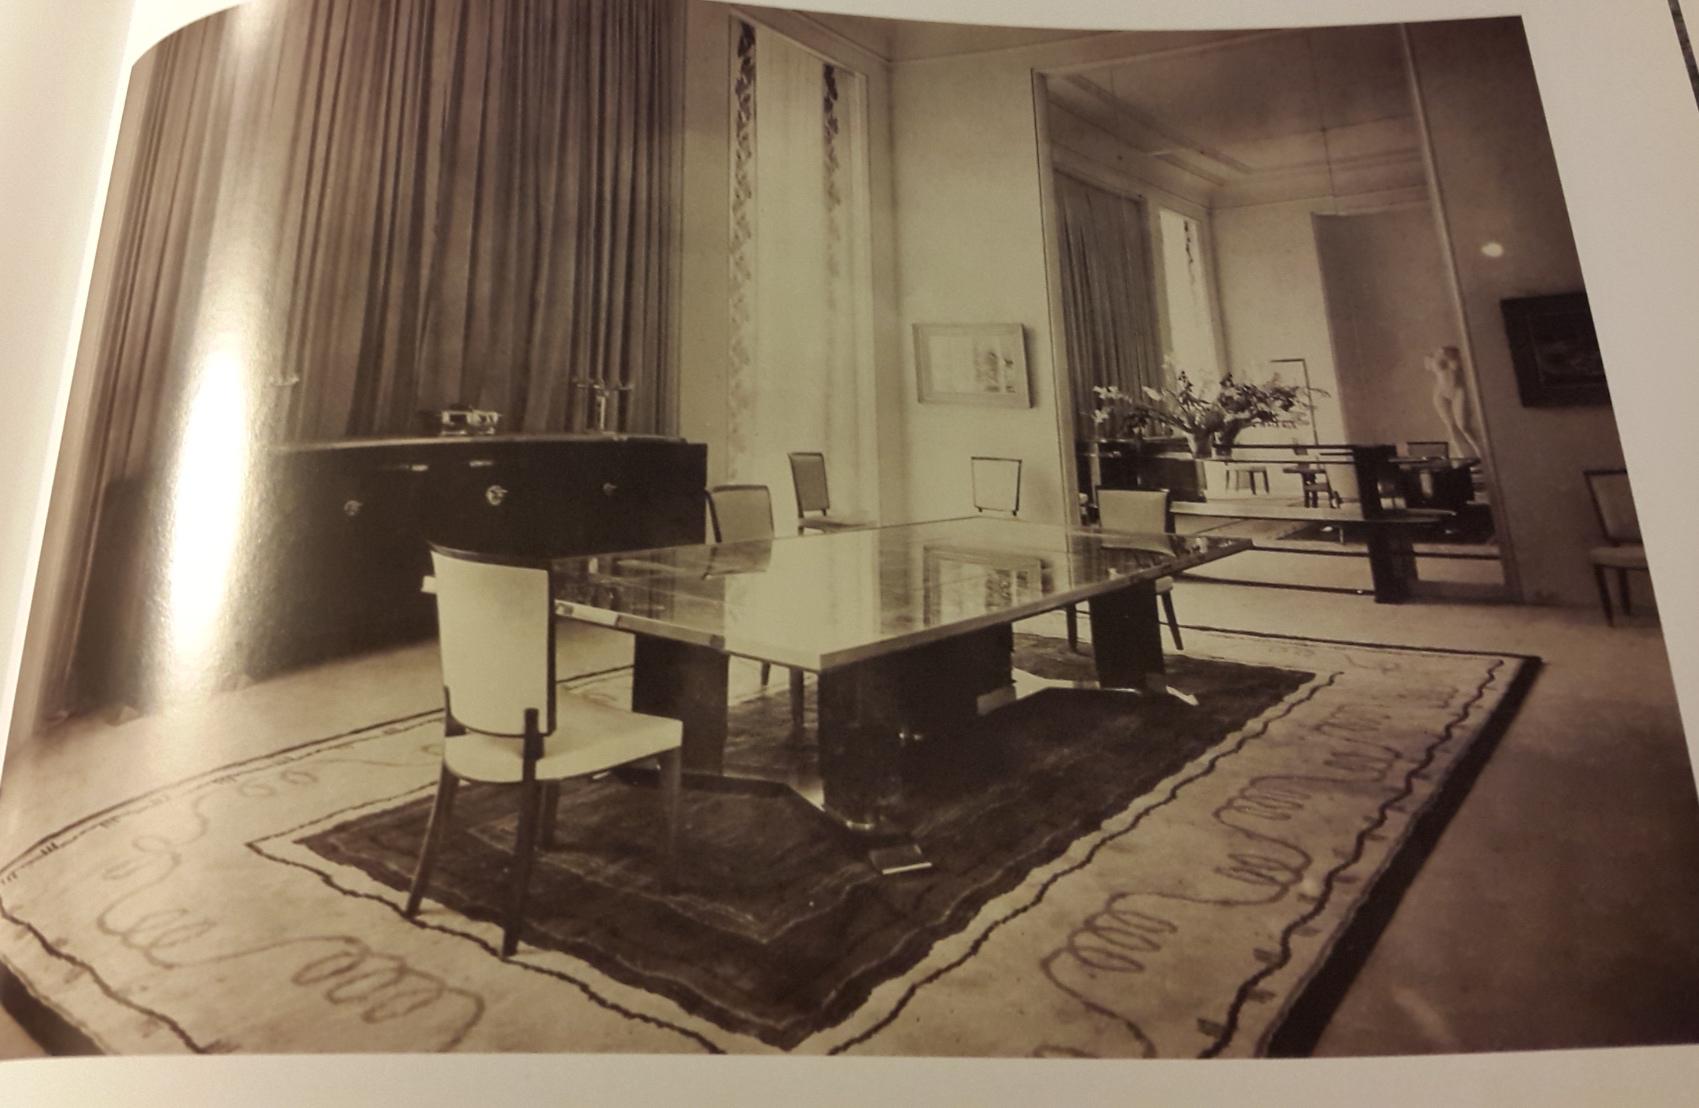 Jules leleu dining room table chairs 1937 paris for Salon leleu